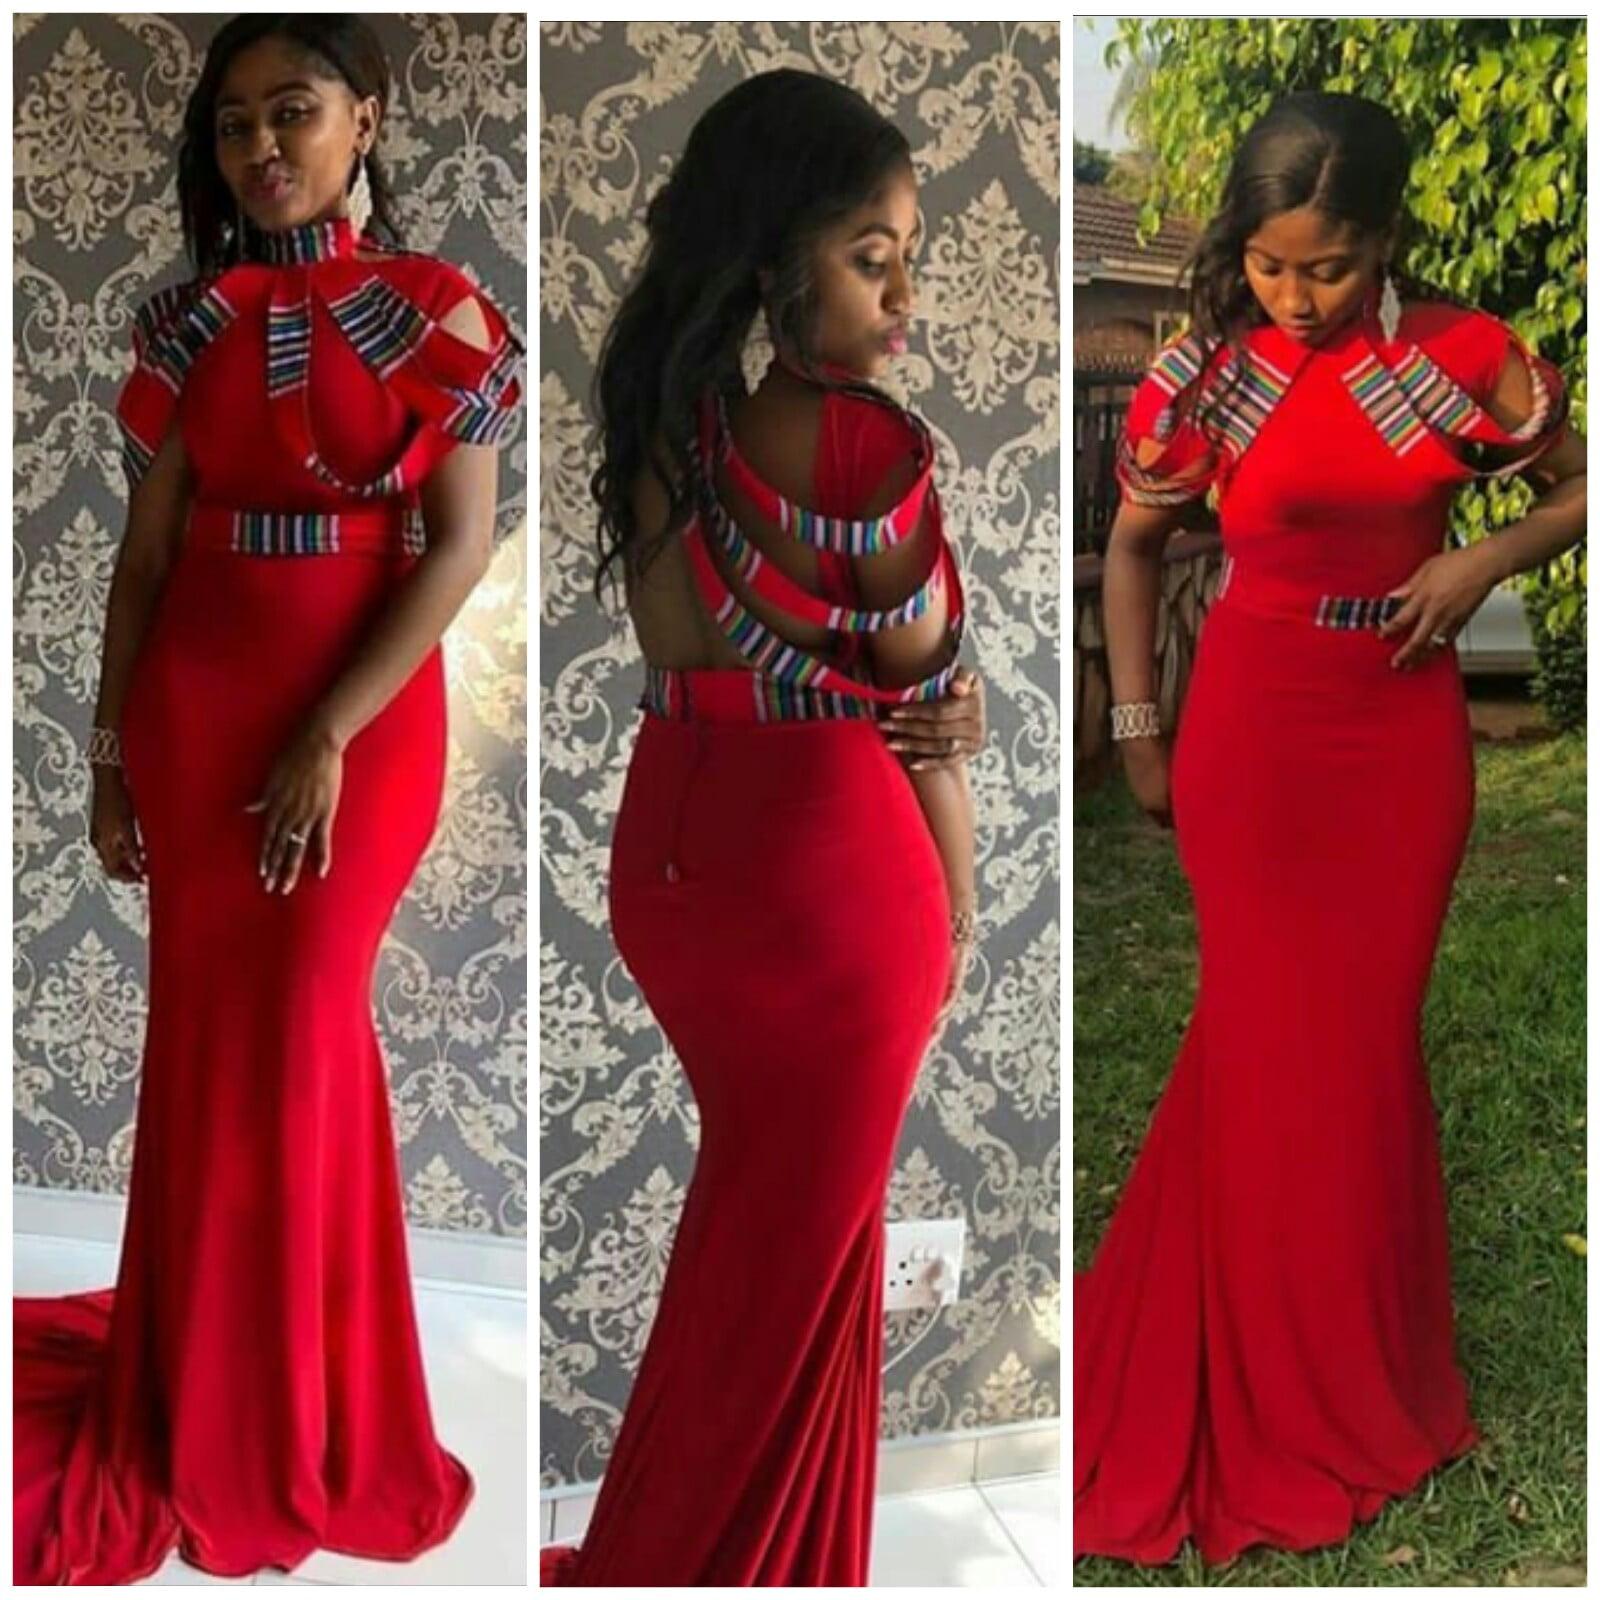 Venda Traditional Modern Dresses: Bride In Lovely Red Venda Traditional Wedding Dress